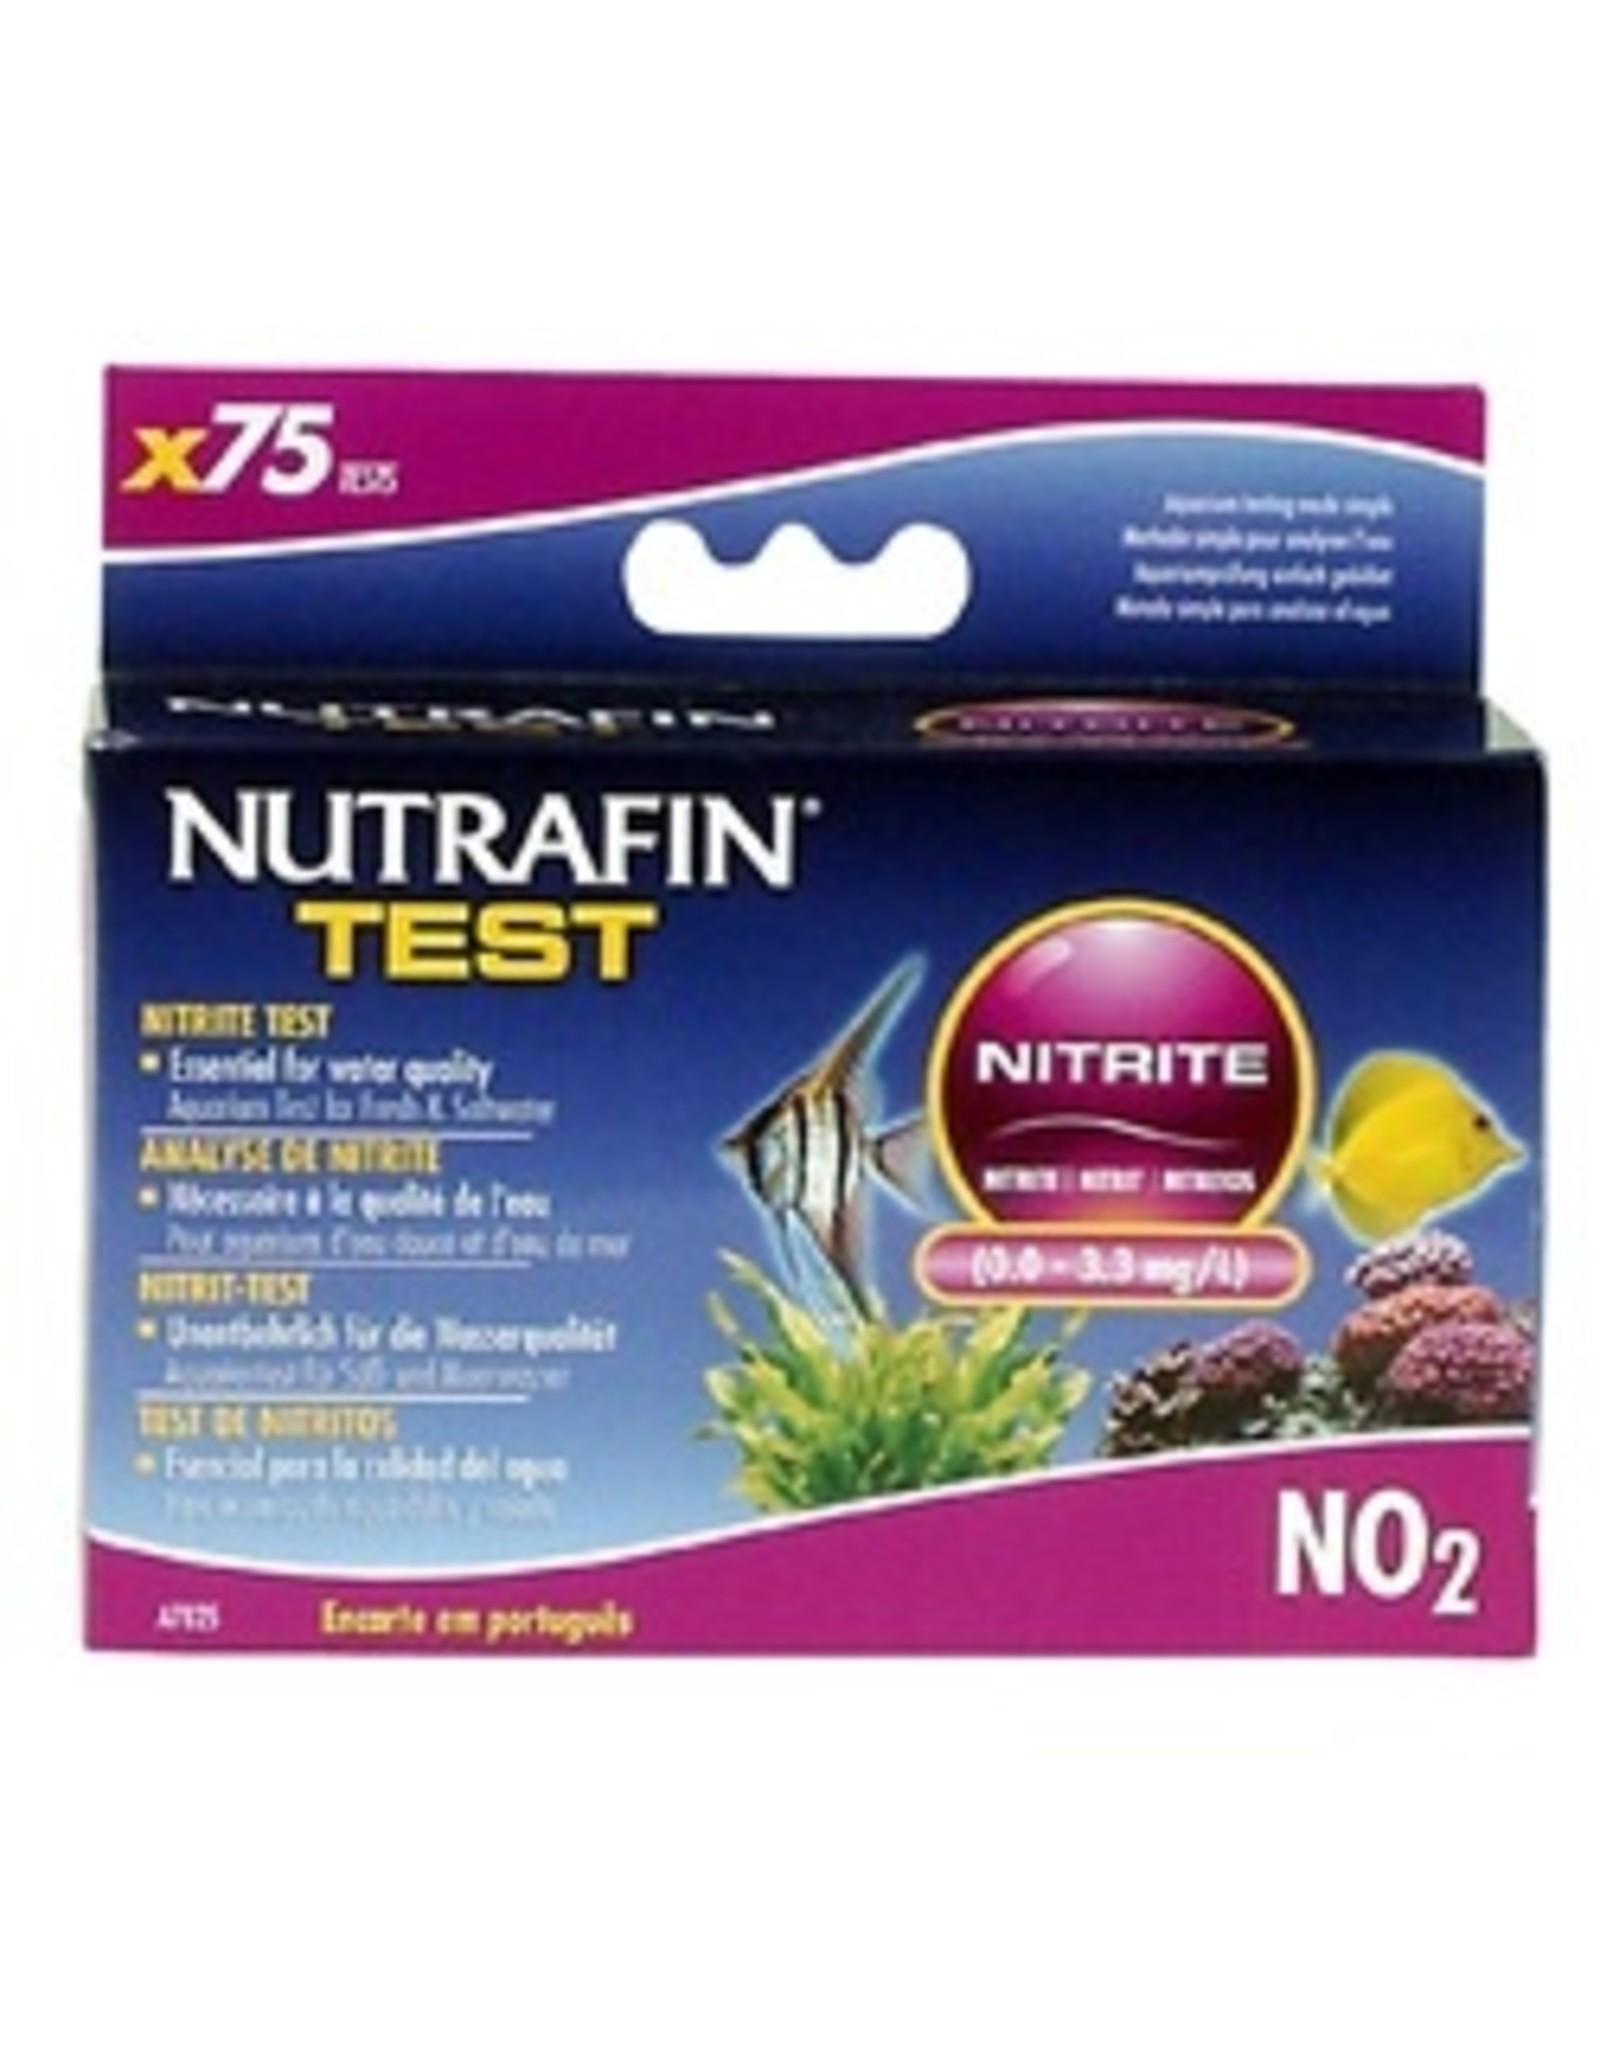 NF - Nutrafin Nitrite 75 Tests